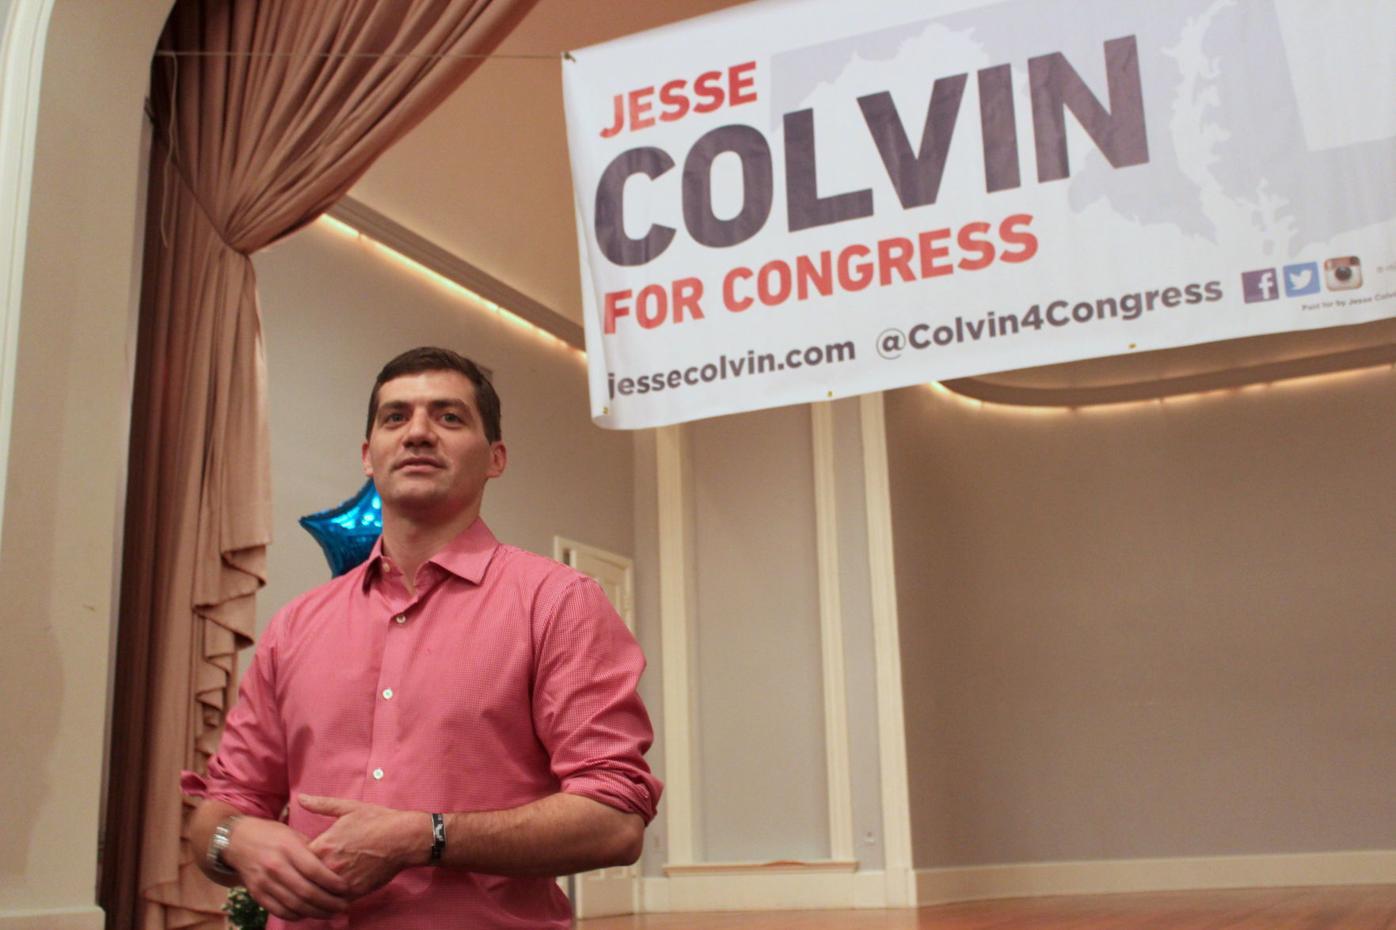 Jesse Colvin results